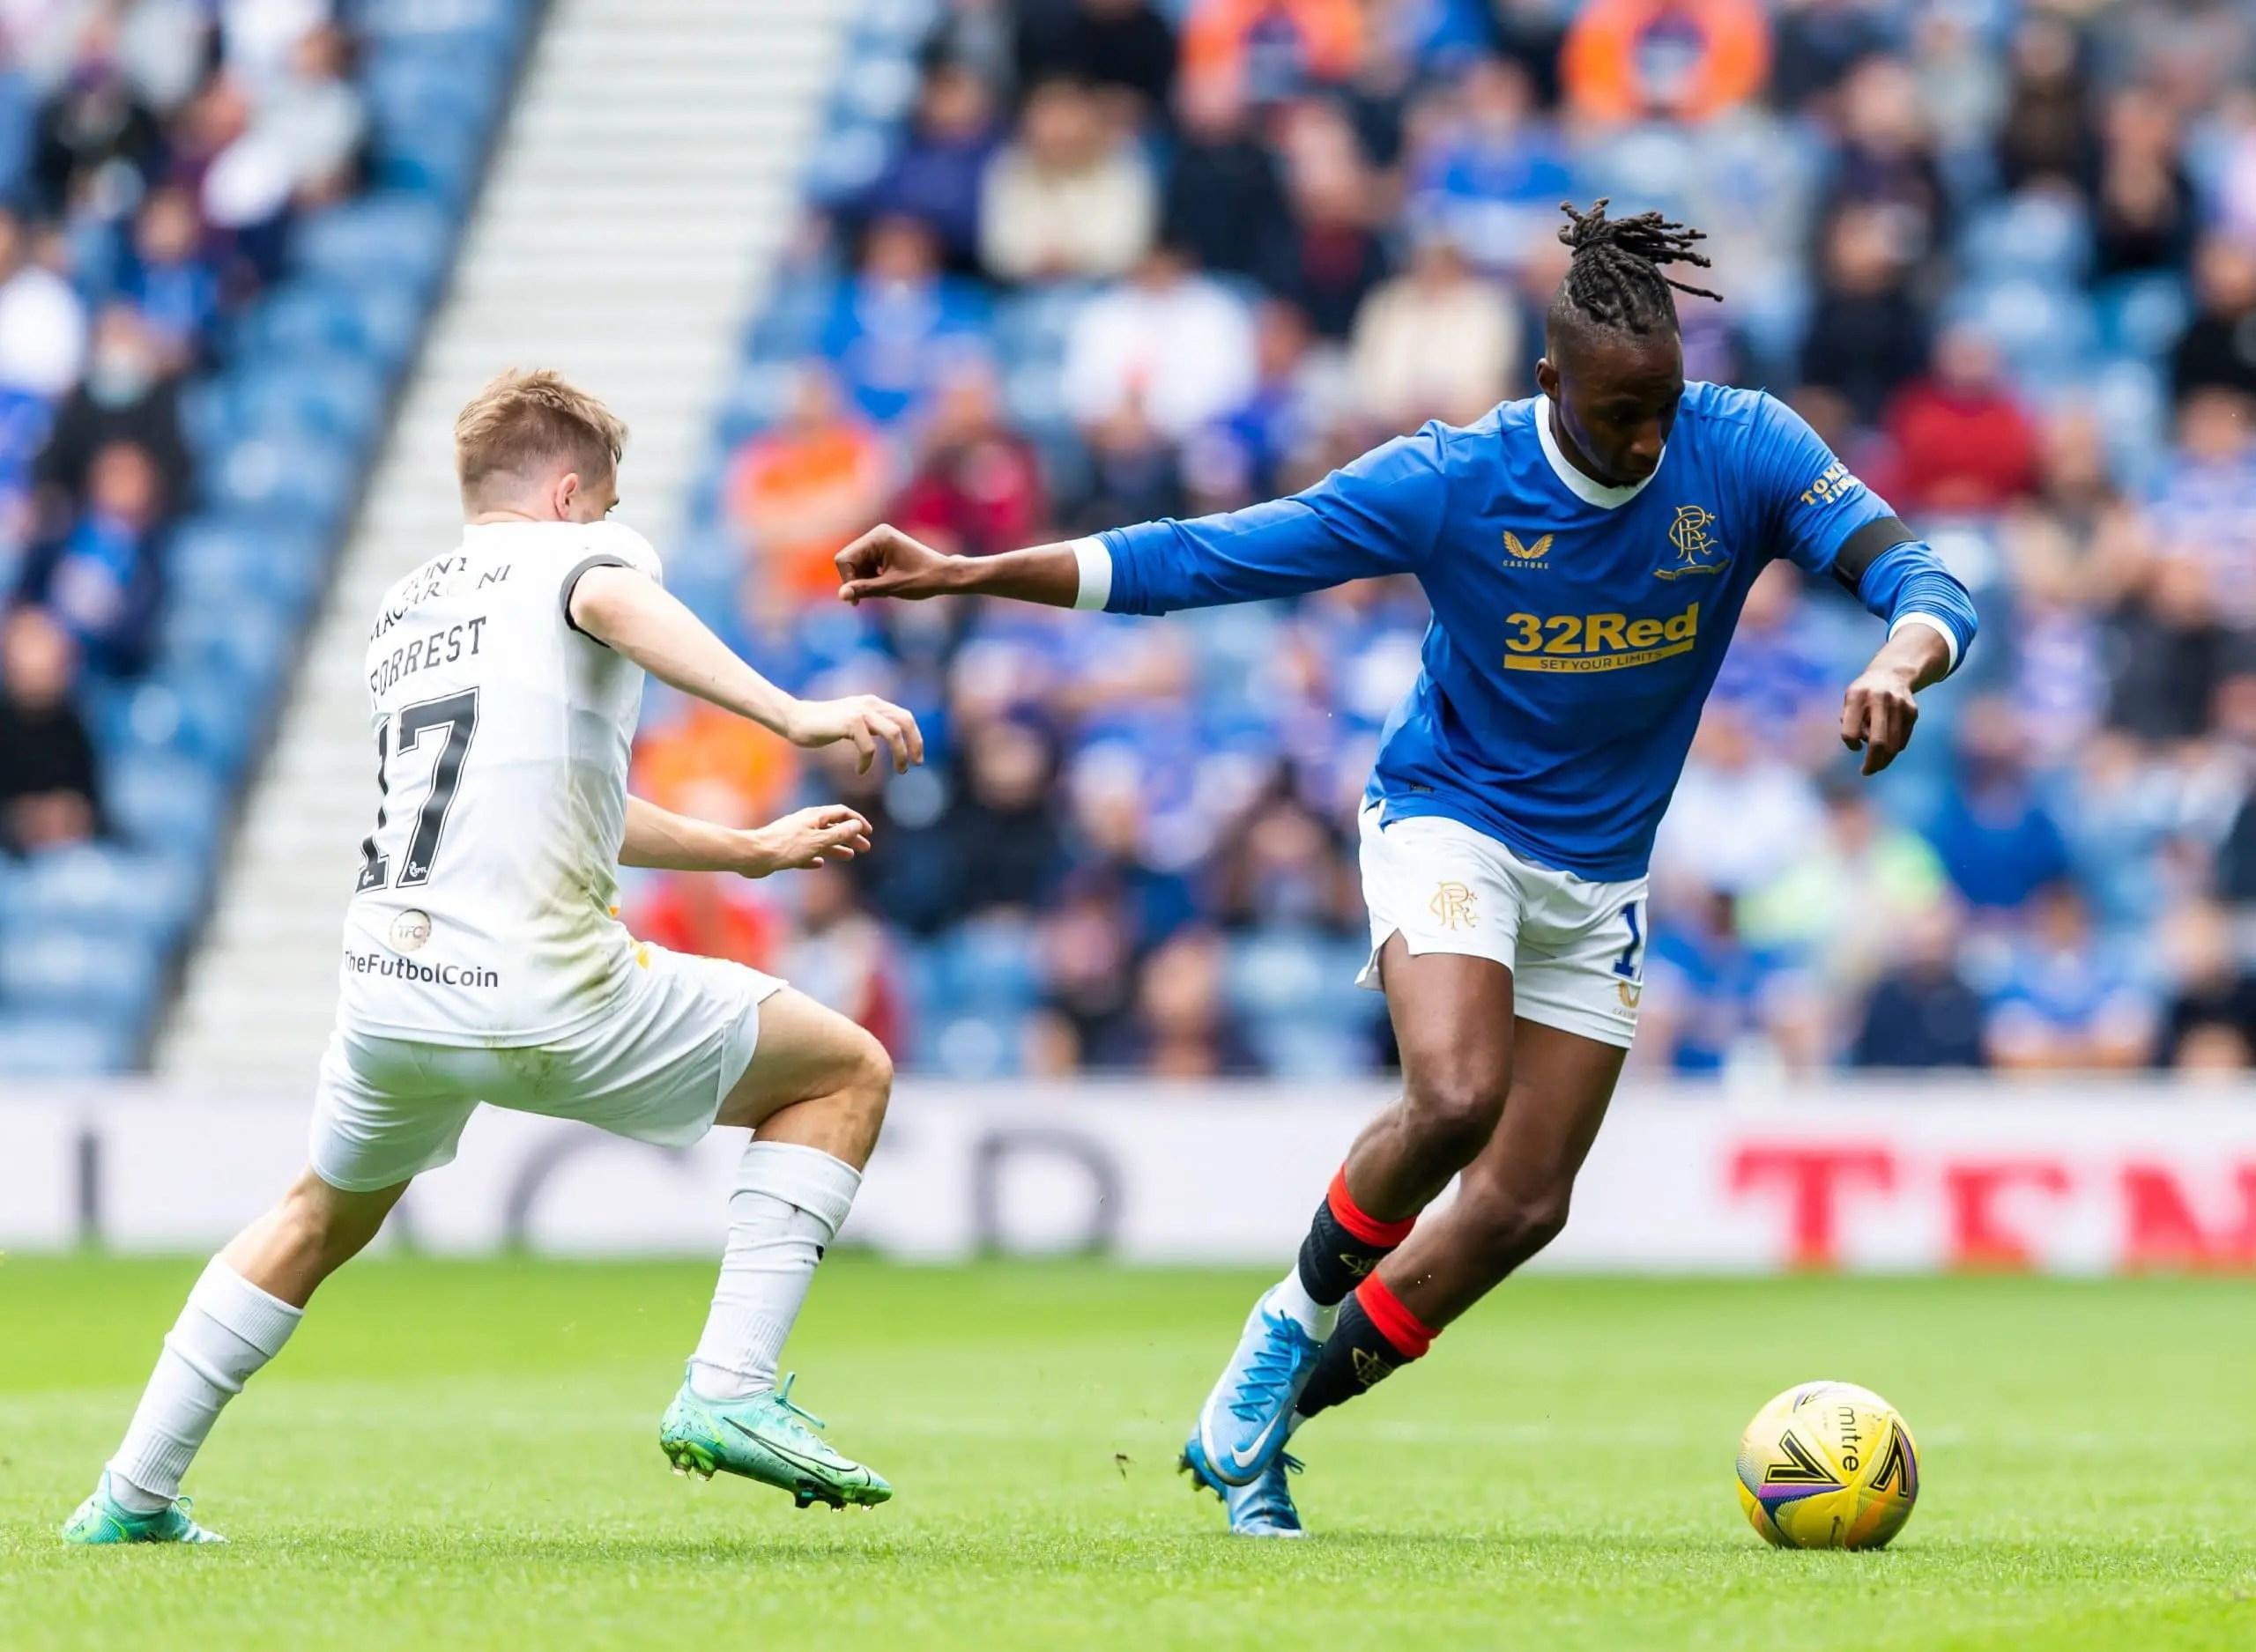 Scotland: Aribo, Balogun In Action As Rangers Thrash  Livingston In Season Opener